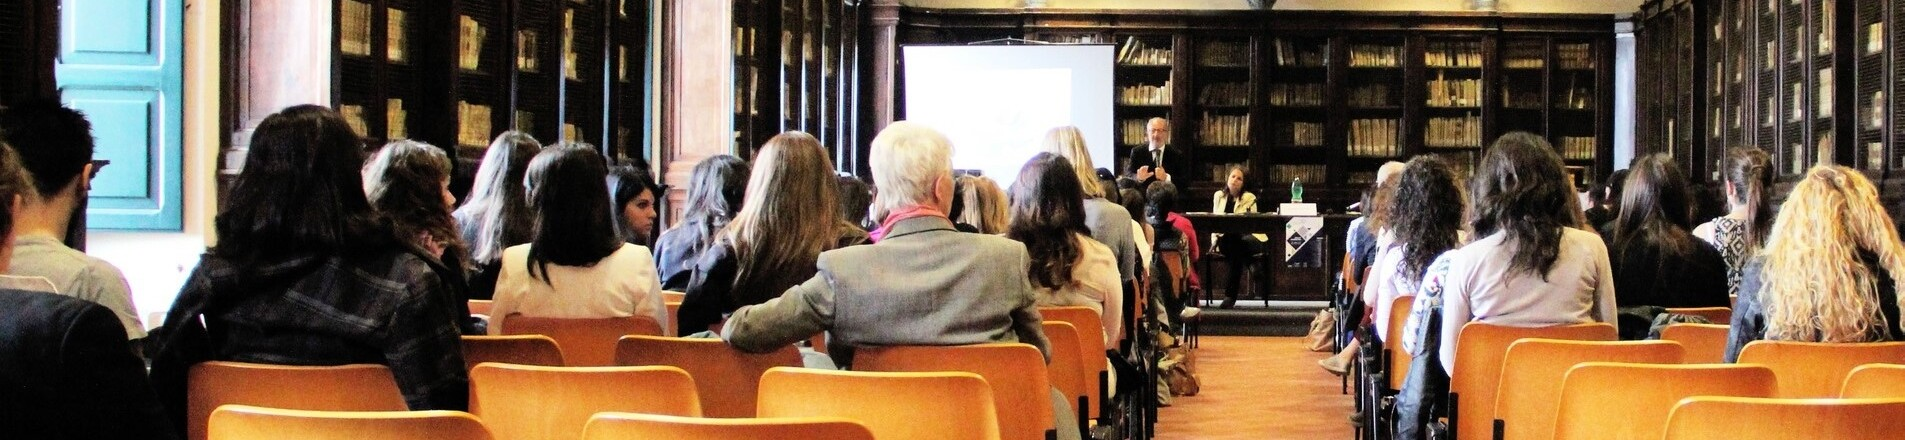 DVLA holds its first mock mediation event